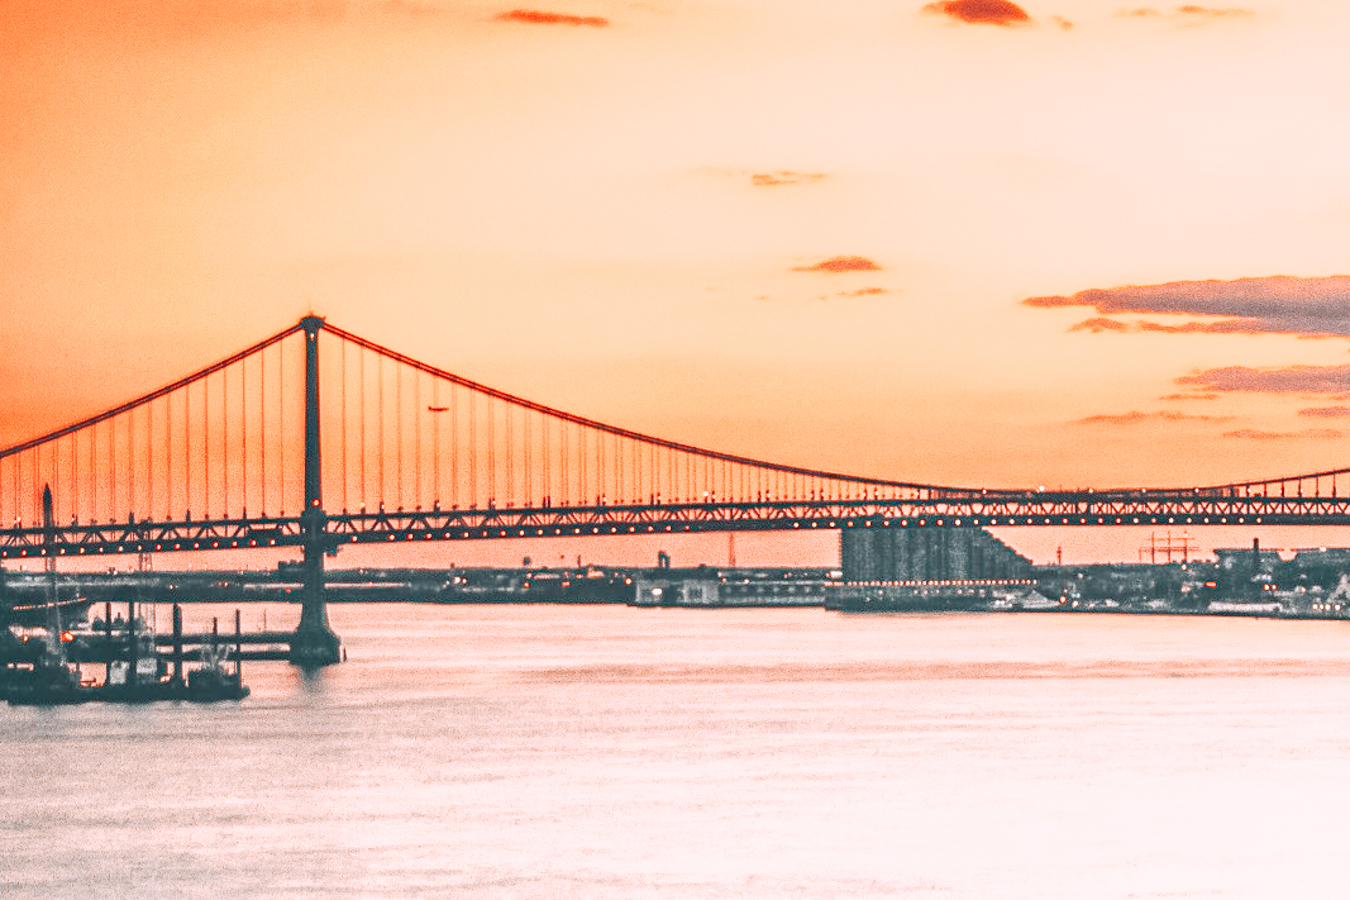 View of the Benjamin Franklin Bridge